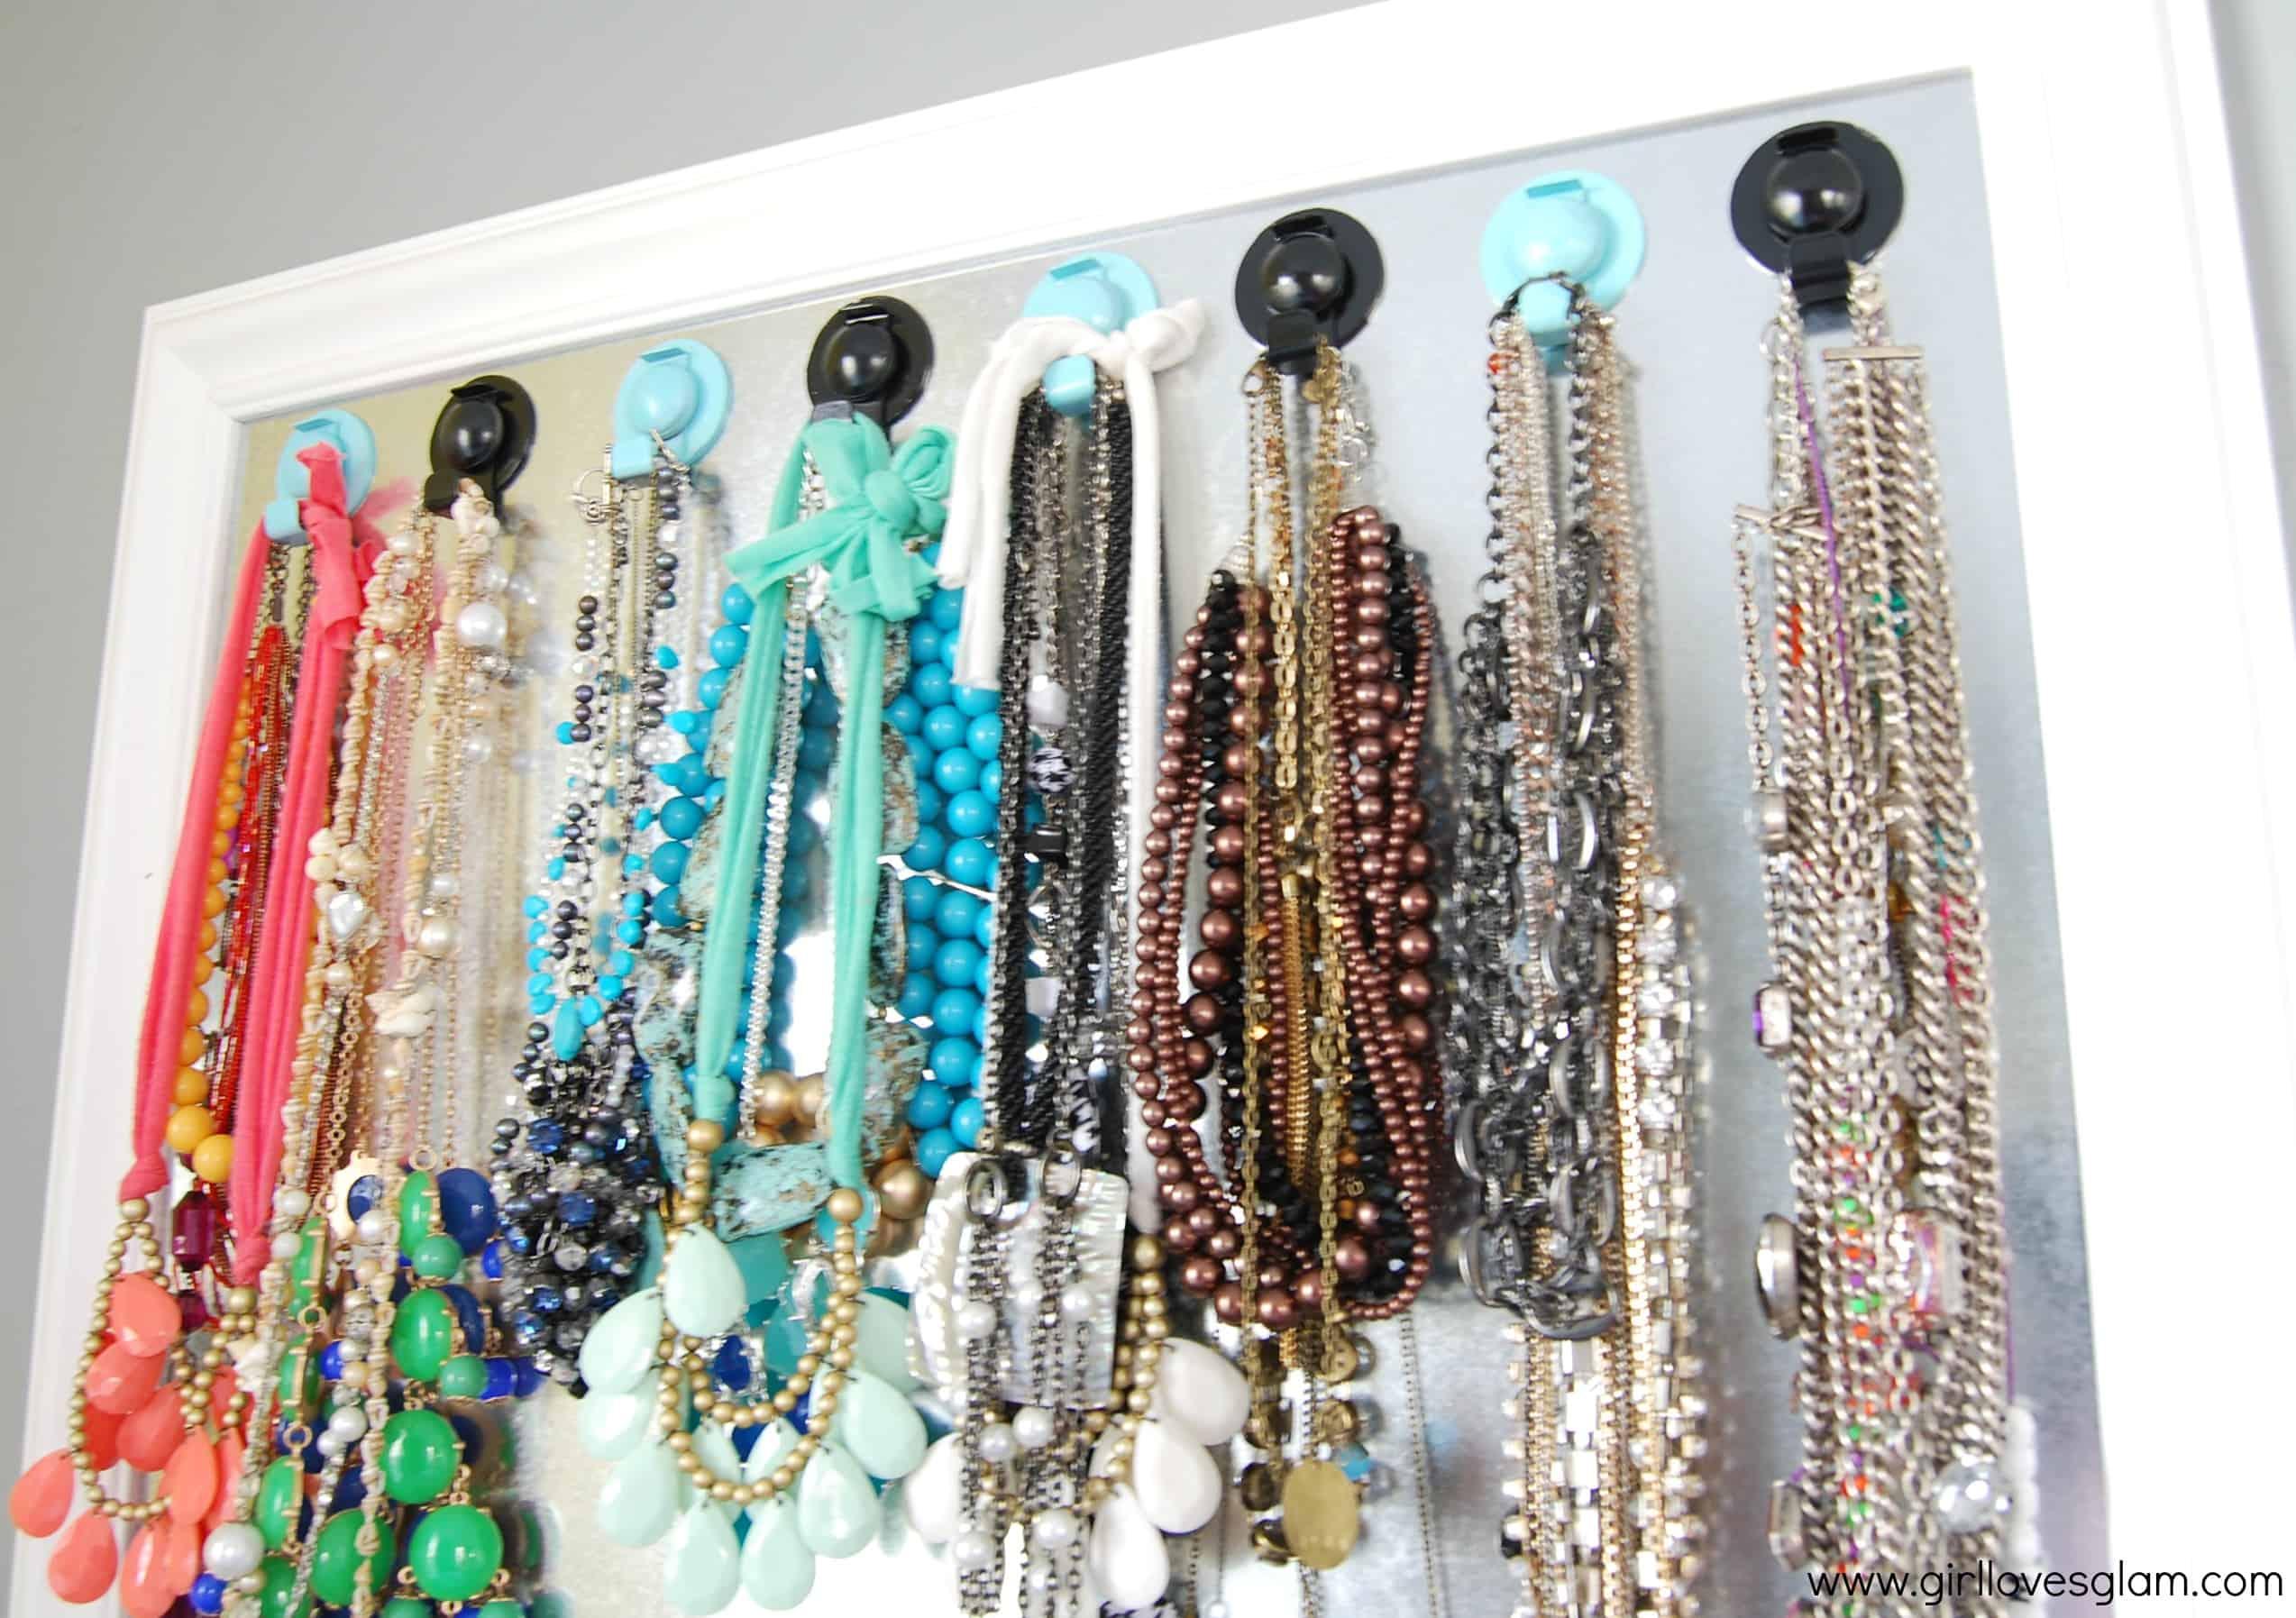 Deco Board Jewelry Hanger Organizer - Girl Loves Glam